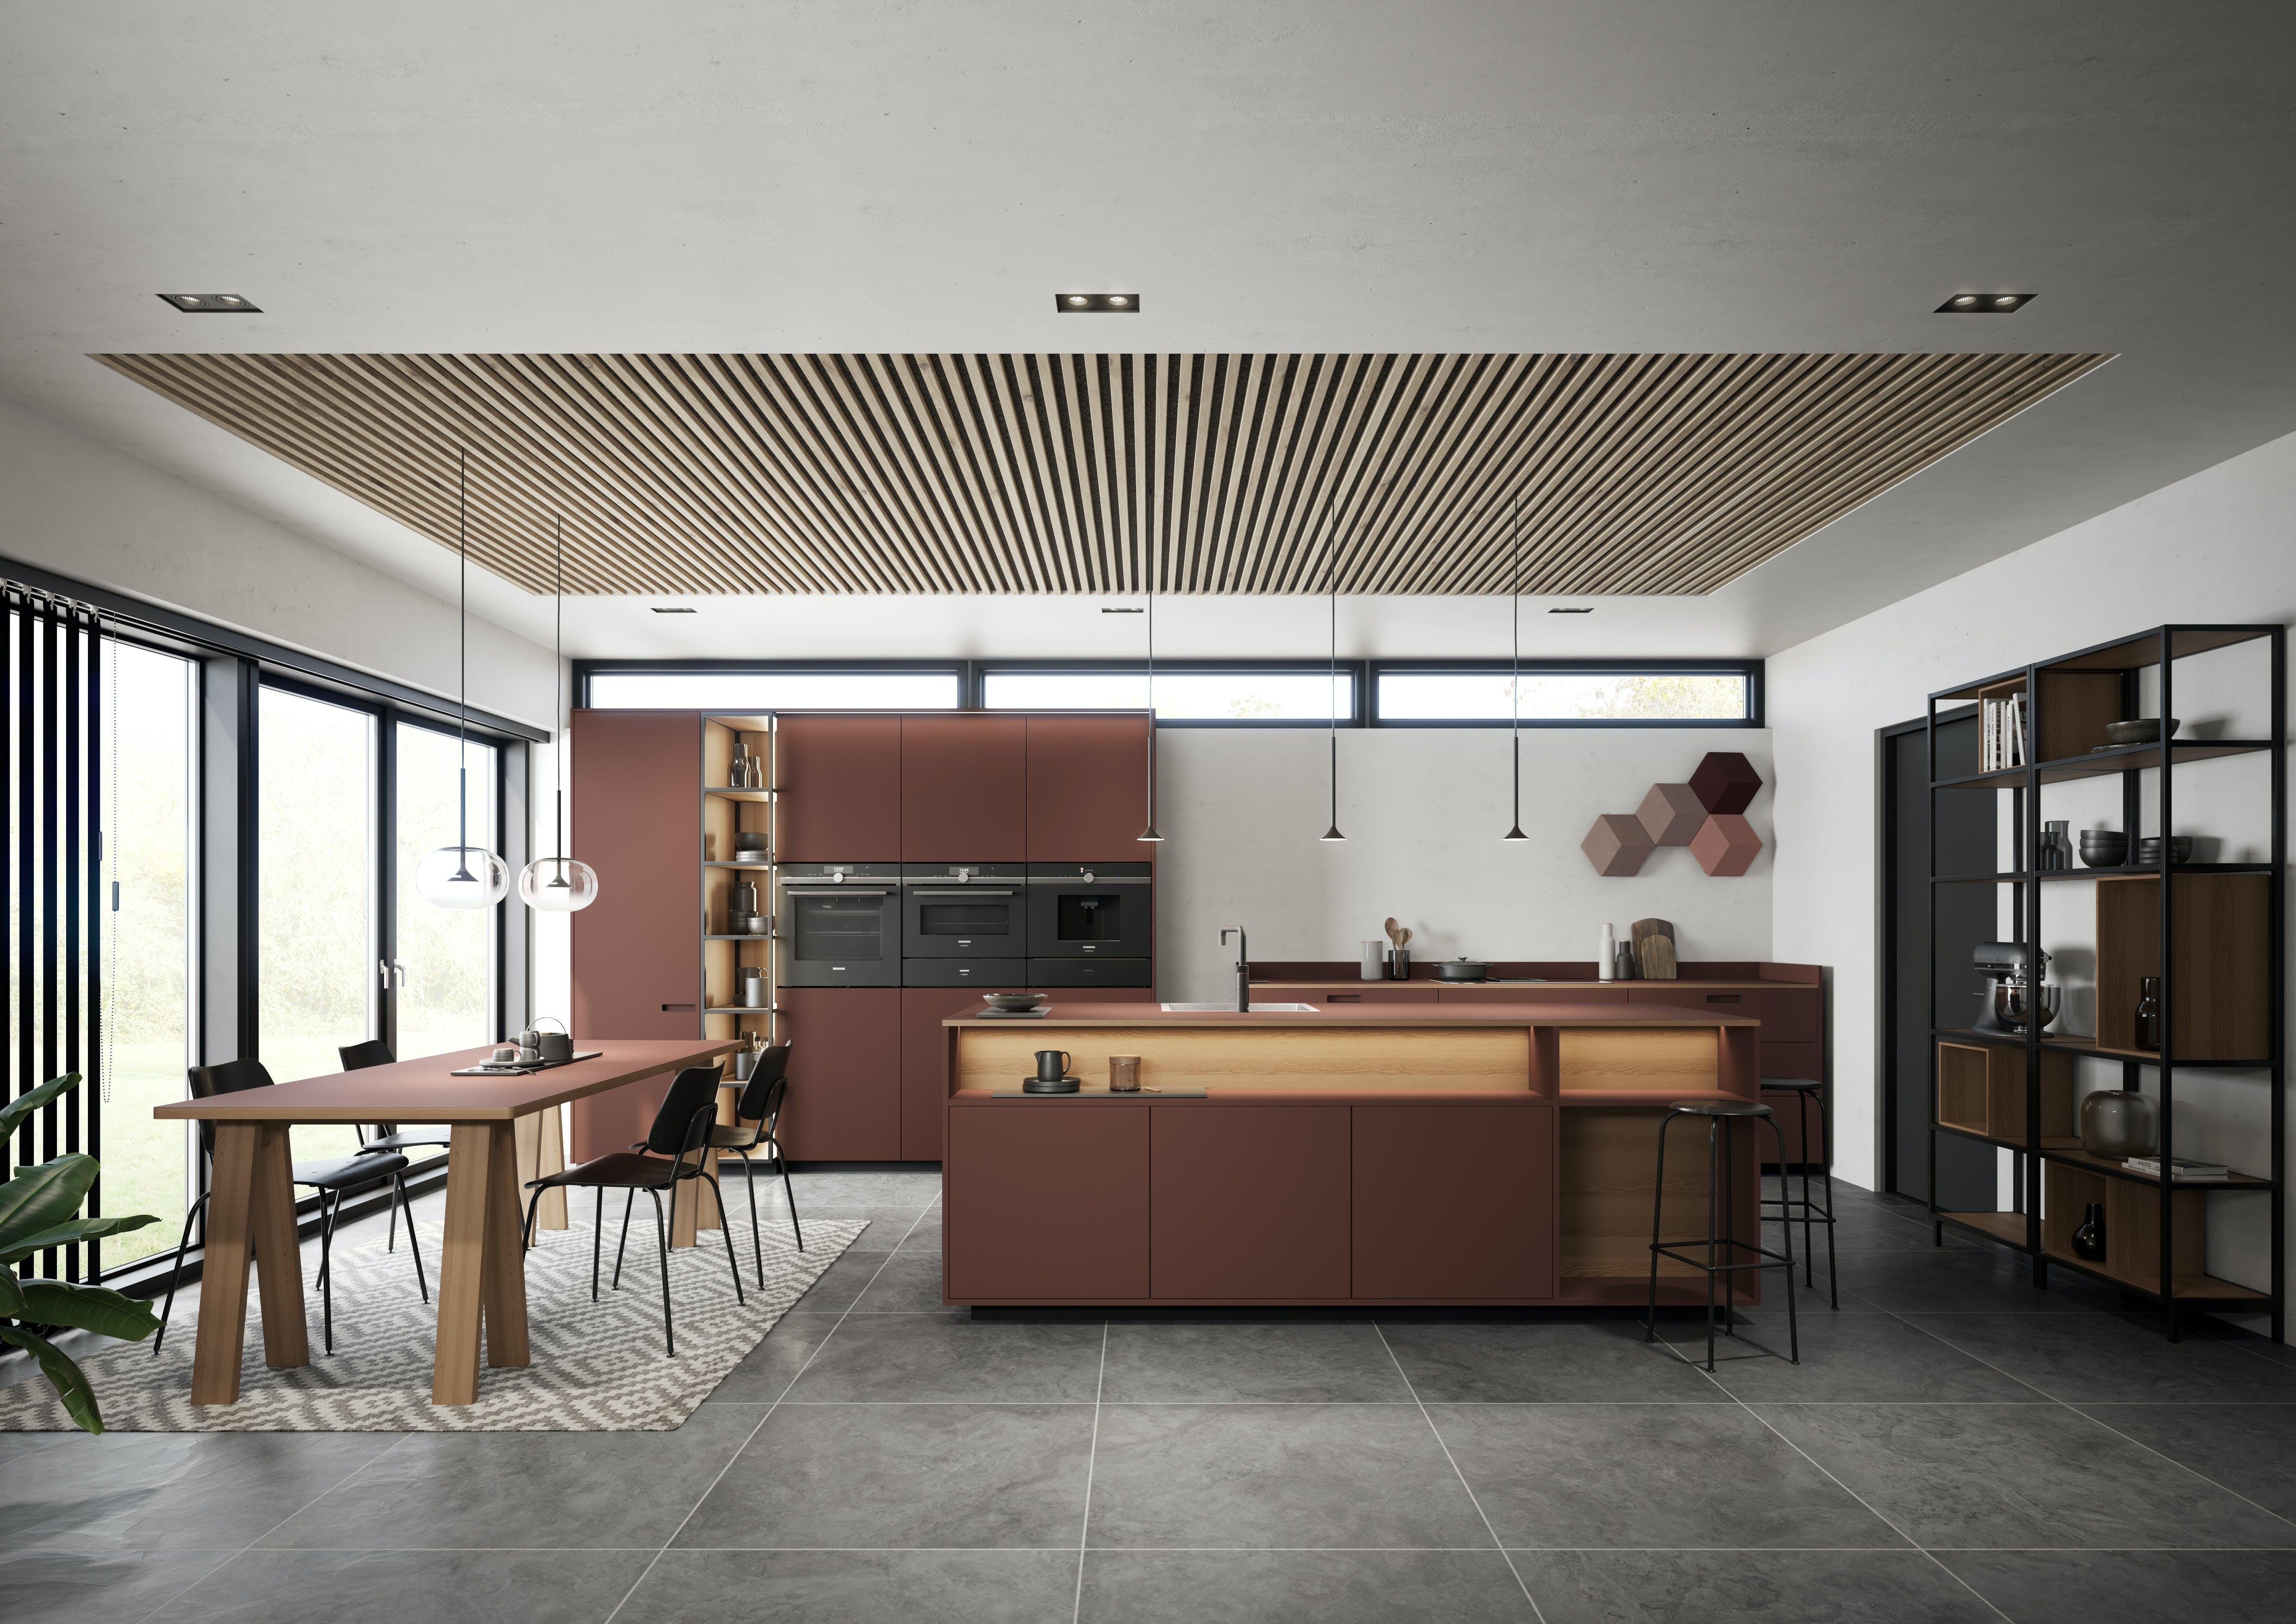 Svane Køkkenet køkkentrends 2019 bladrød